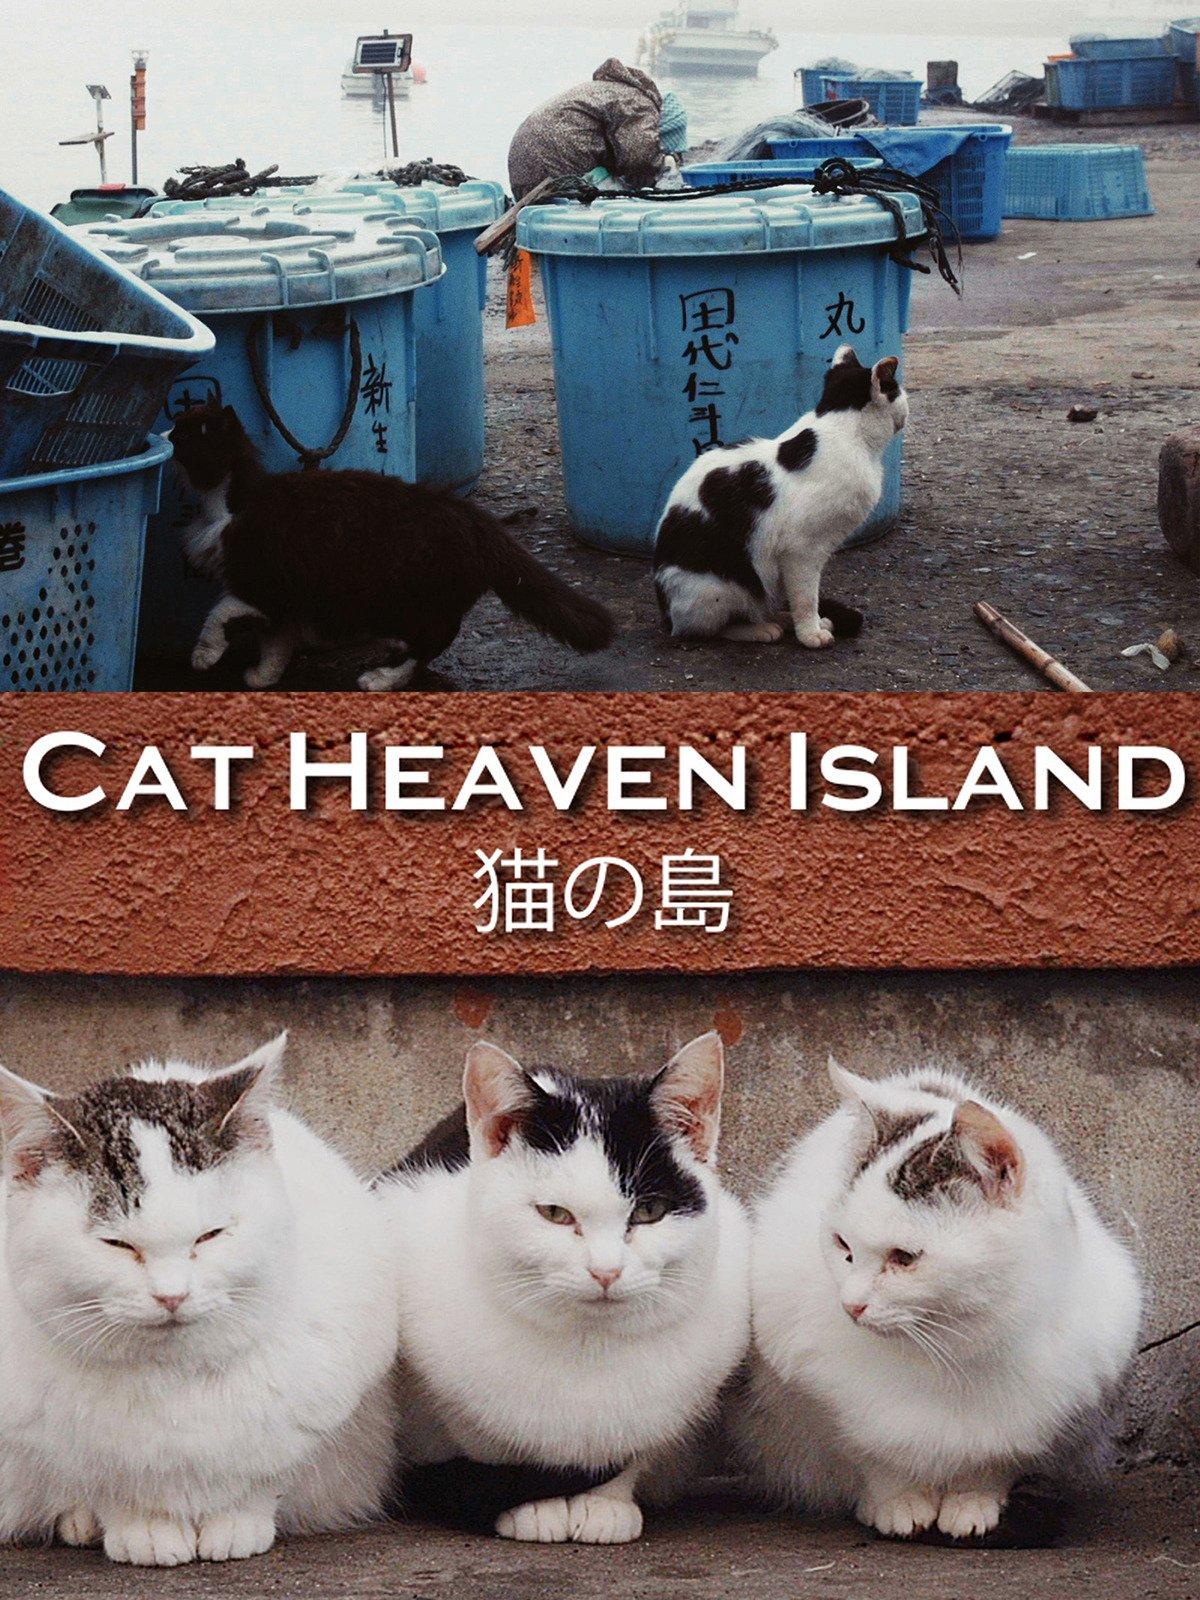 Cat Heaven Island